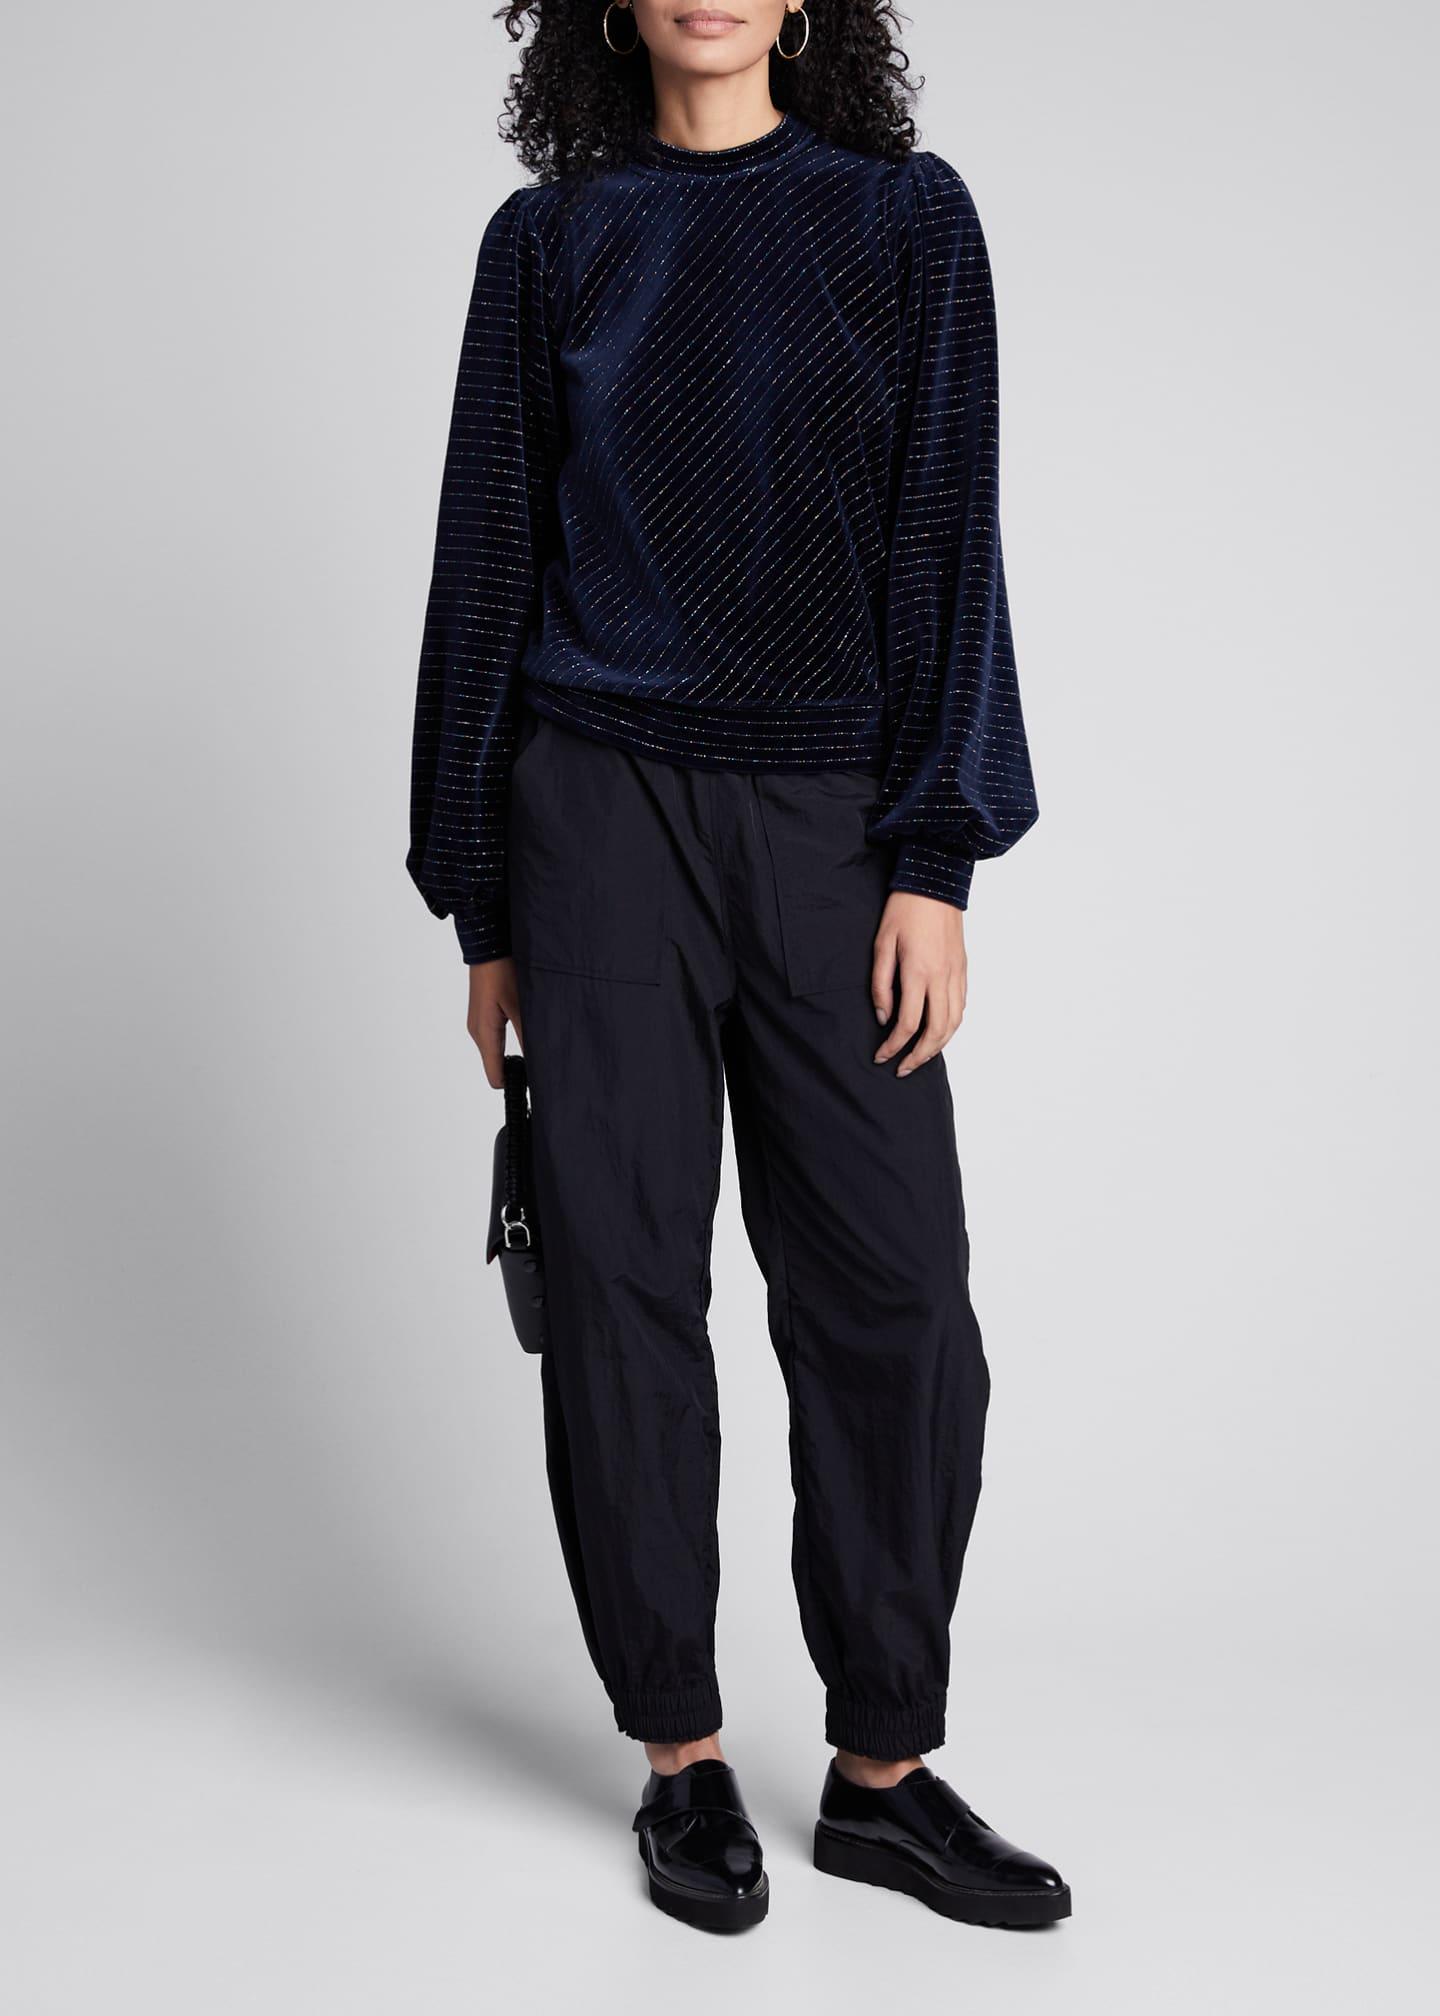 Ganni Velvet Metallic Blouson-Sleeve Sweater